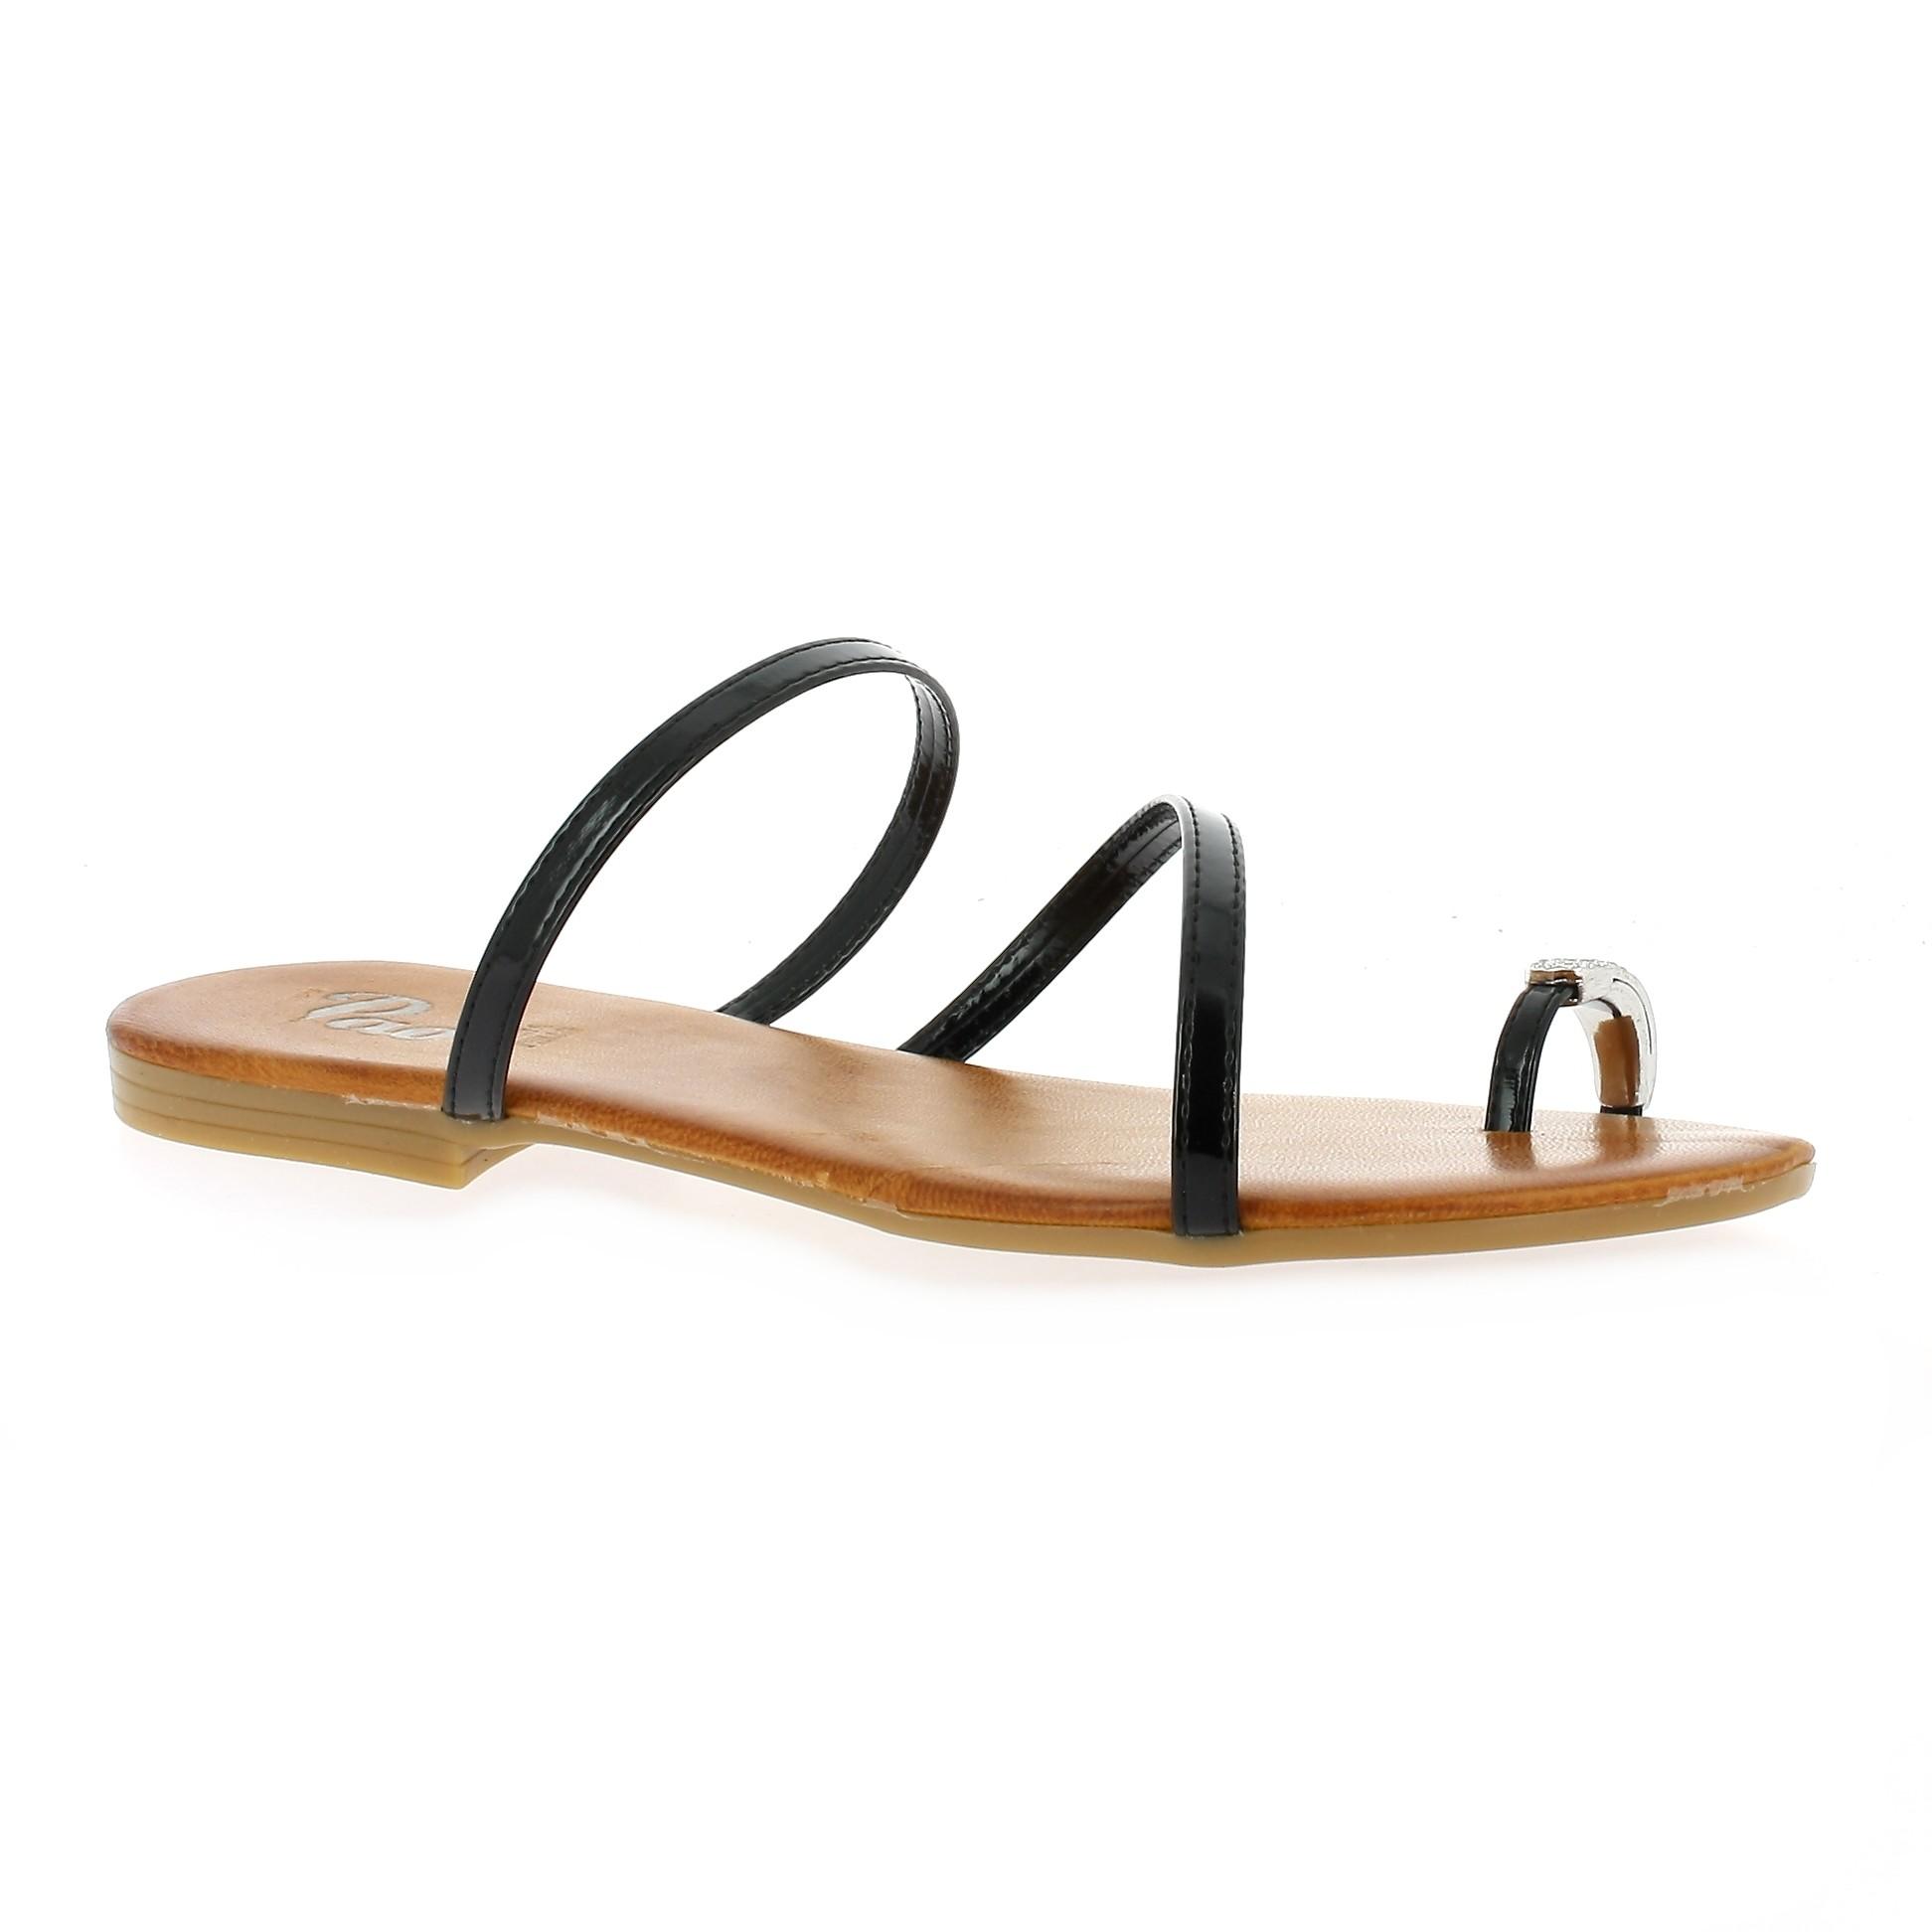 Cuir Nu Vernis Sandale Femme Gh8hua1z Pao Pieds Marine Chaussures UVpGqSzM